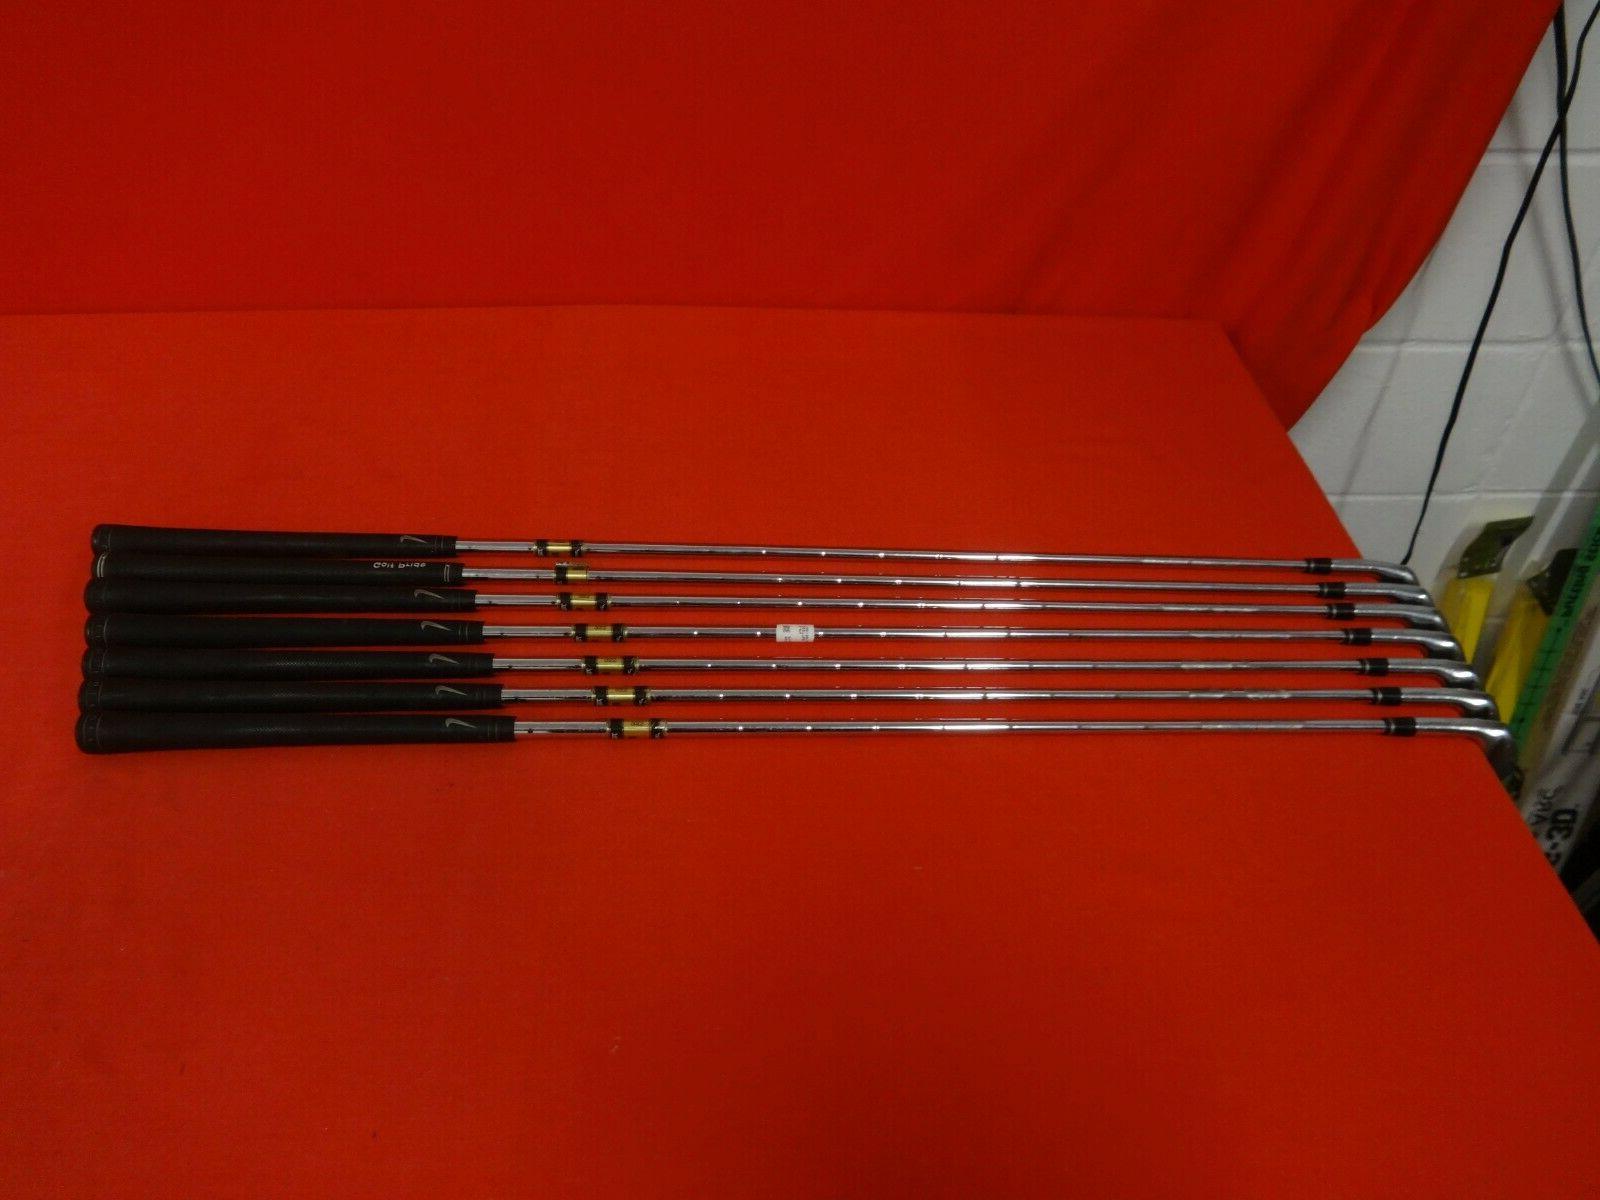 "NIKE Combo 3-PW Iron Set RH Right Handed DG S300 Stiff Steel +1/2"""